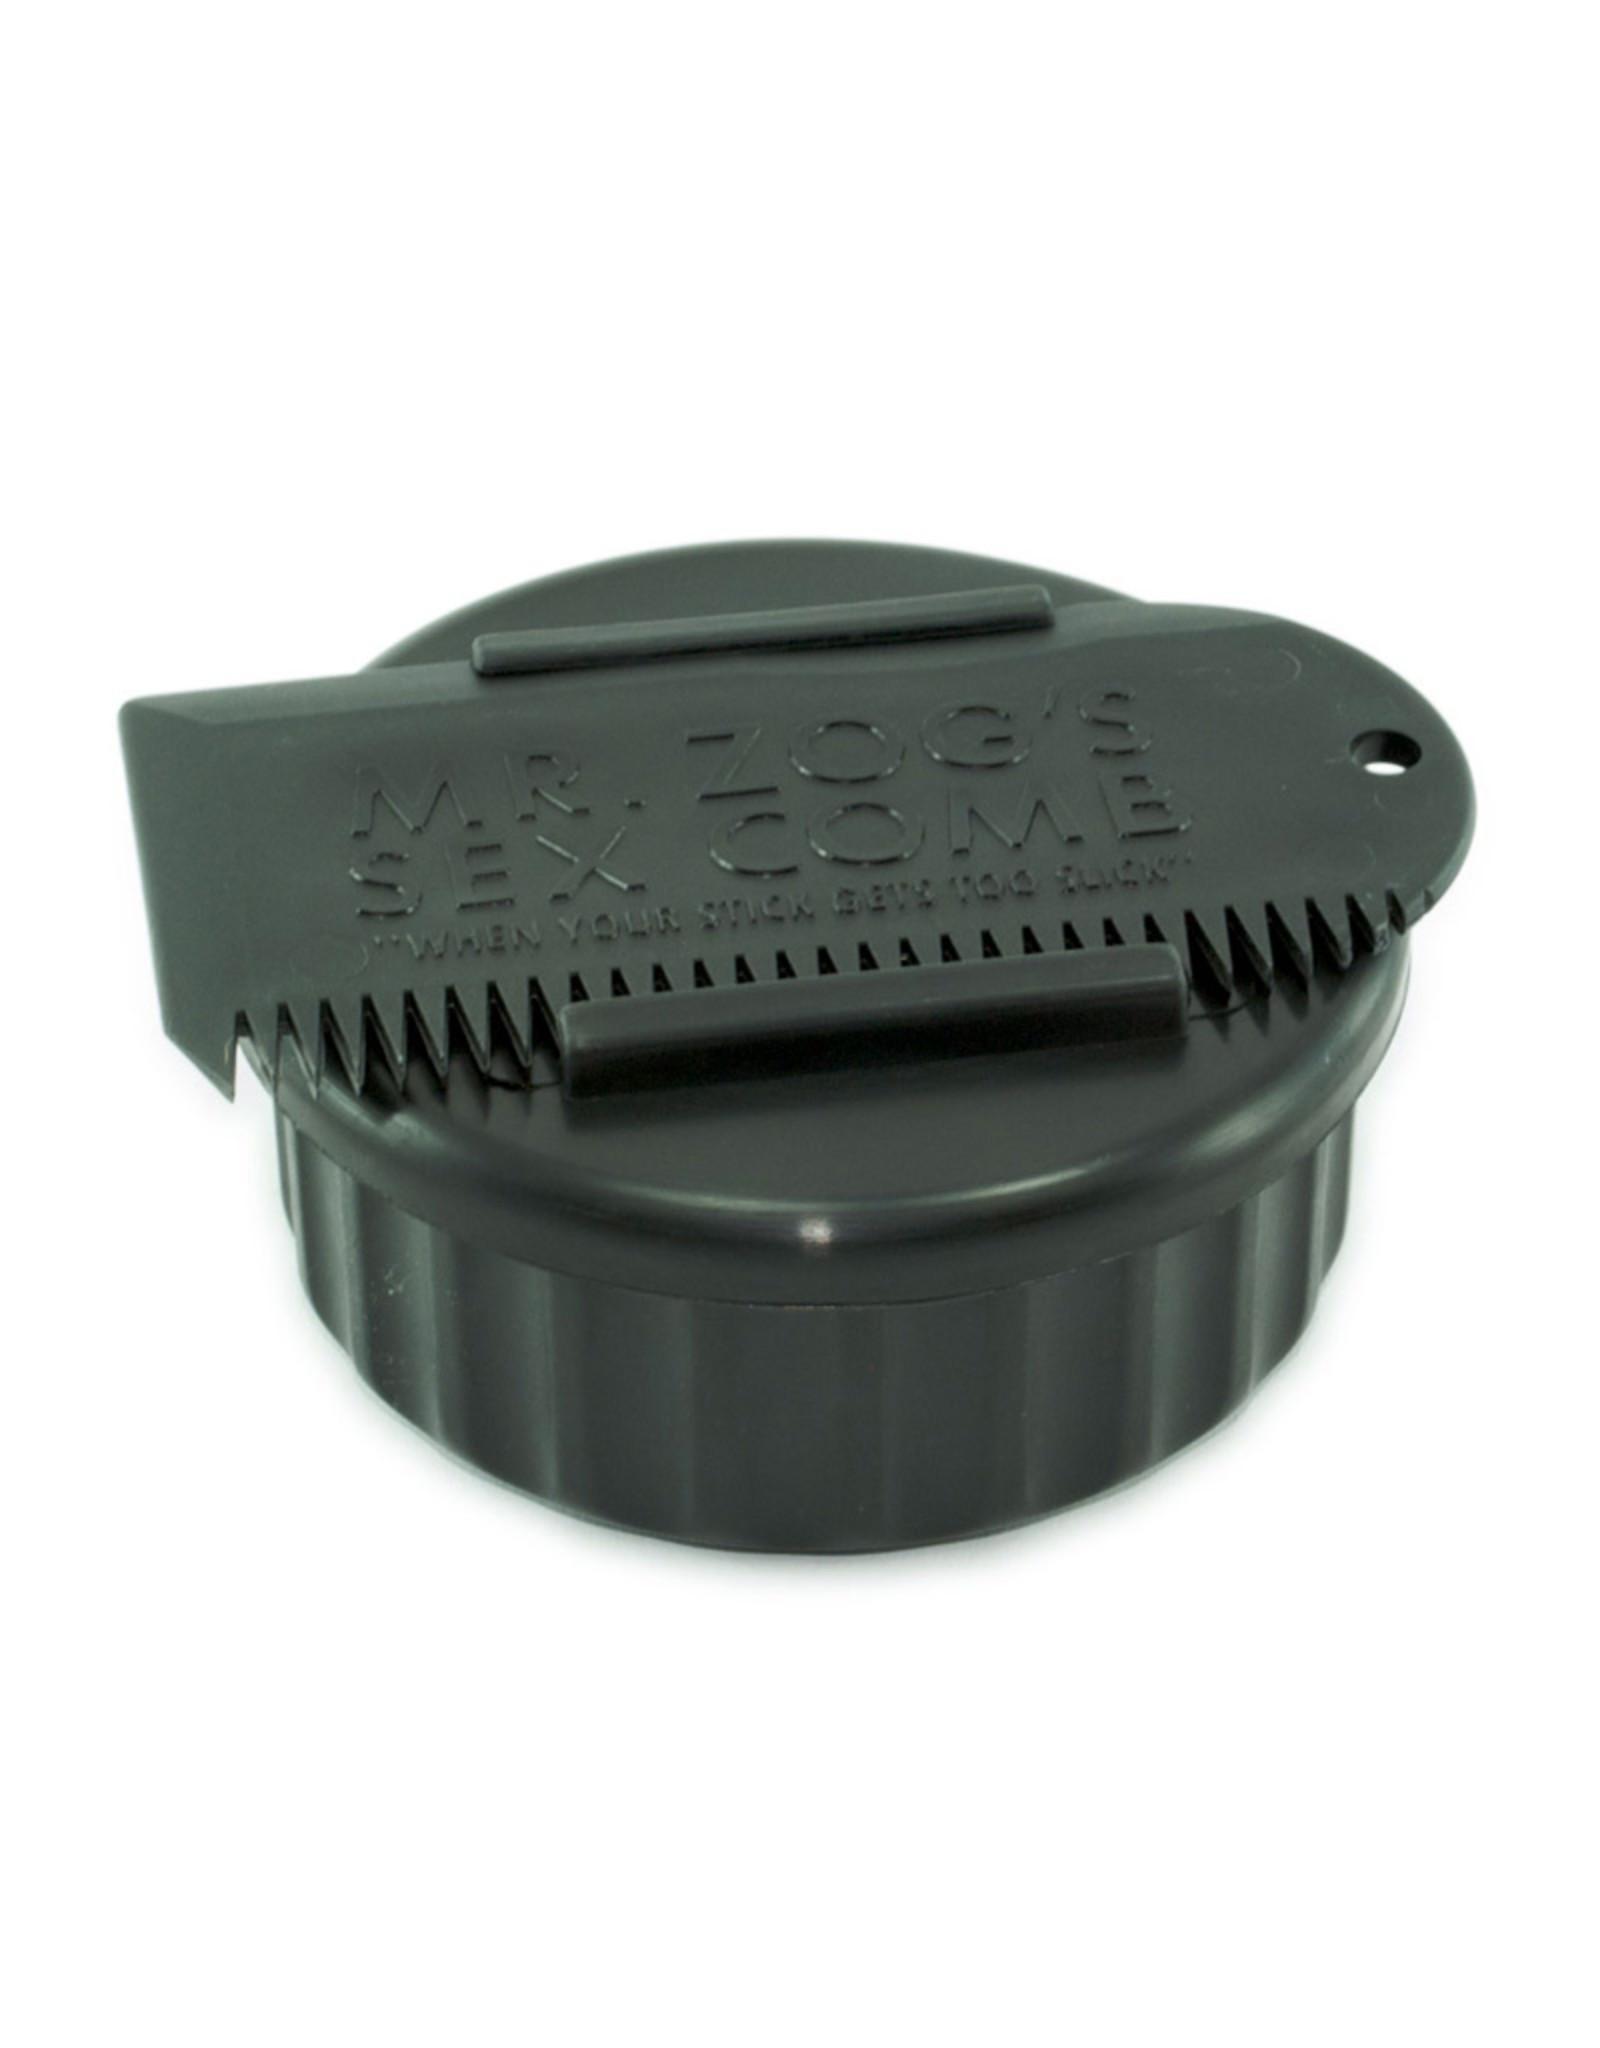 Sex Wax Sex Wax Wax Container & Comb Black